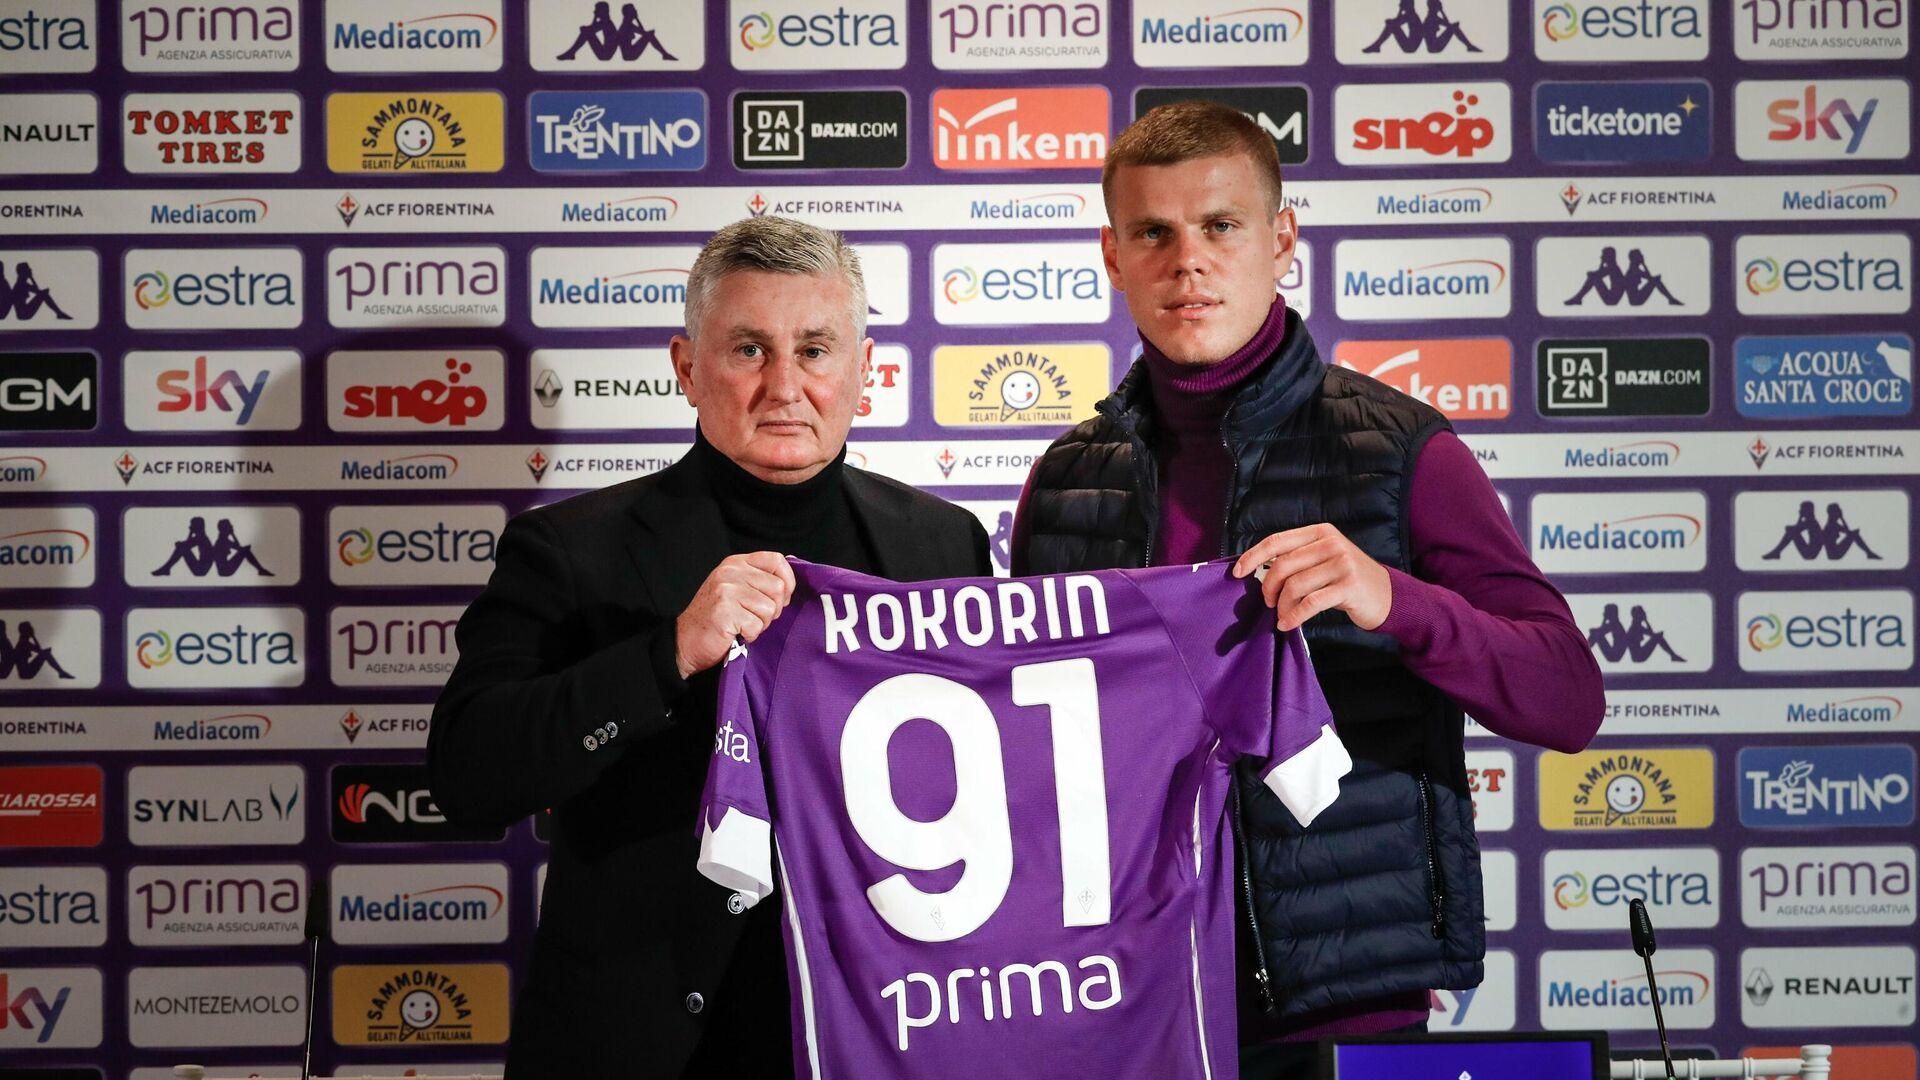 Кокорин получил разрешение на работу в Италии - Спорт РИА Новости,  01.02.2021